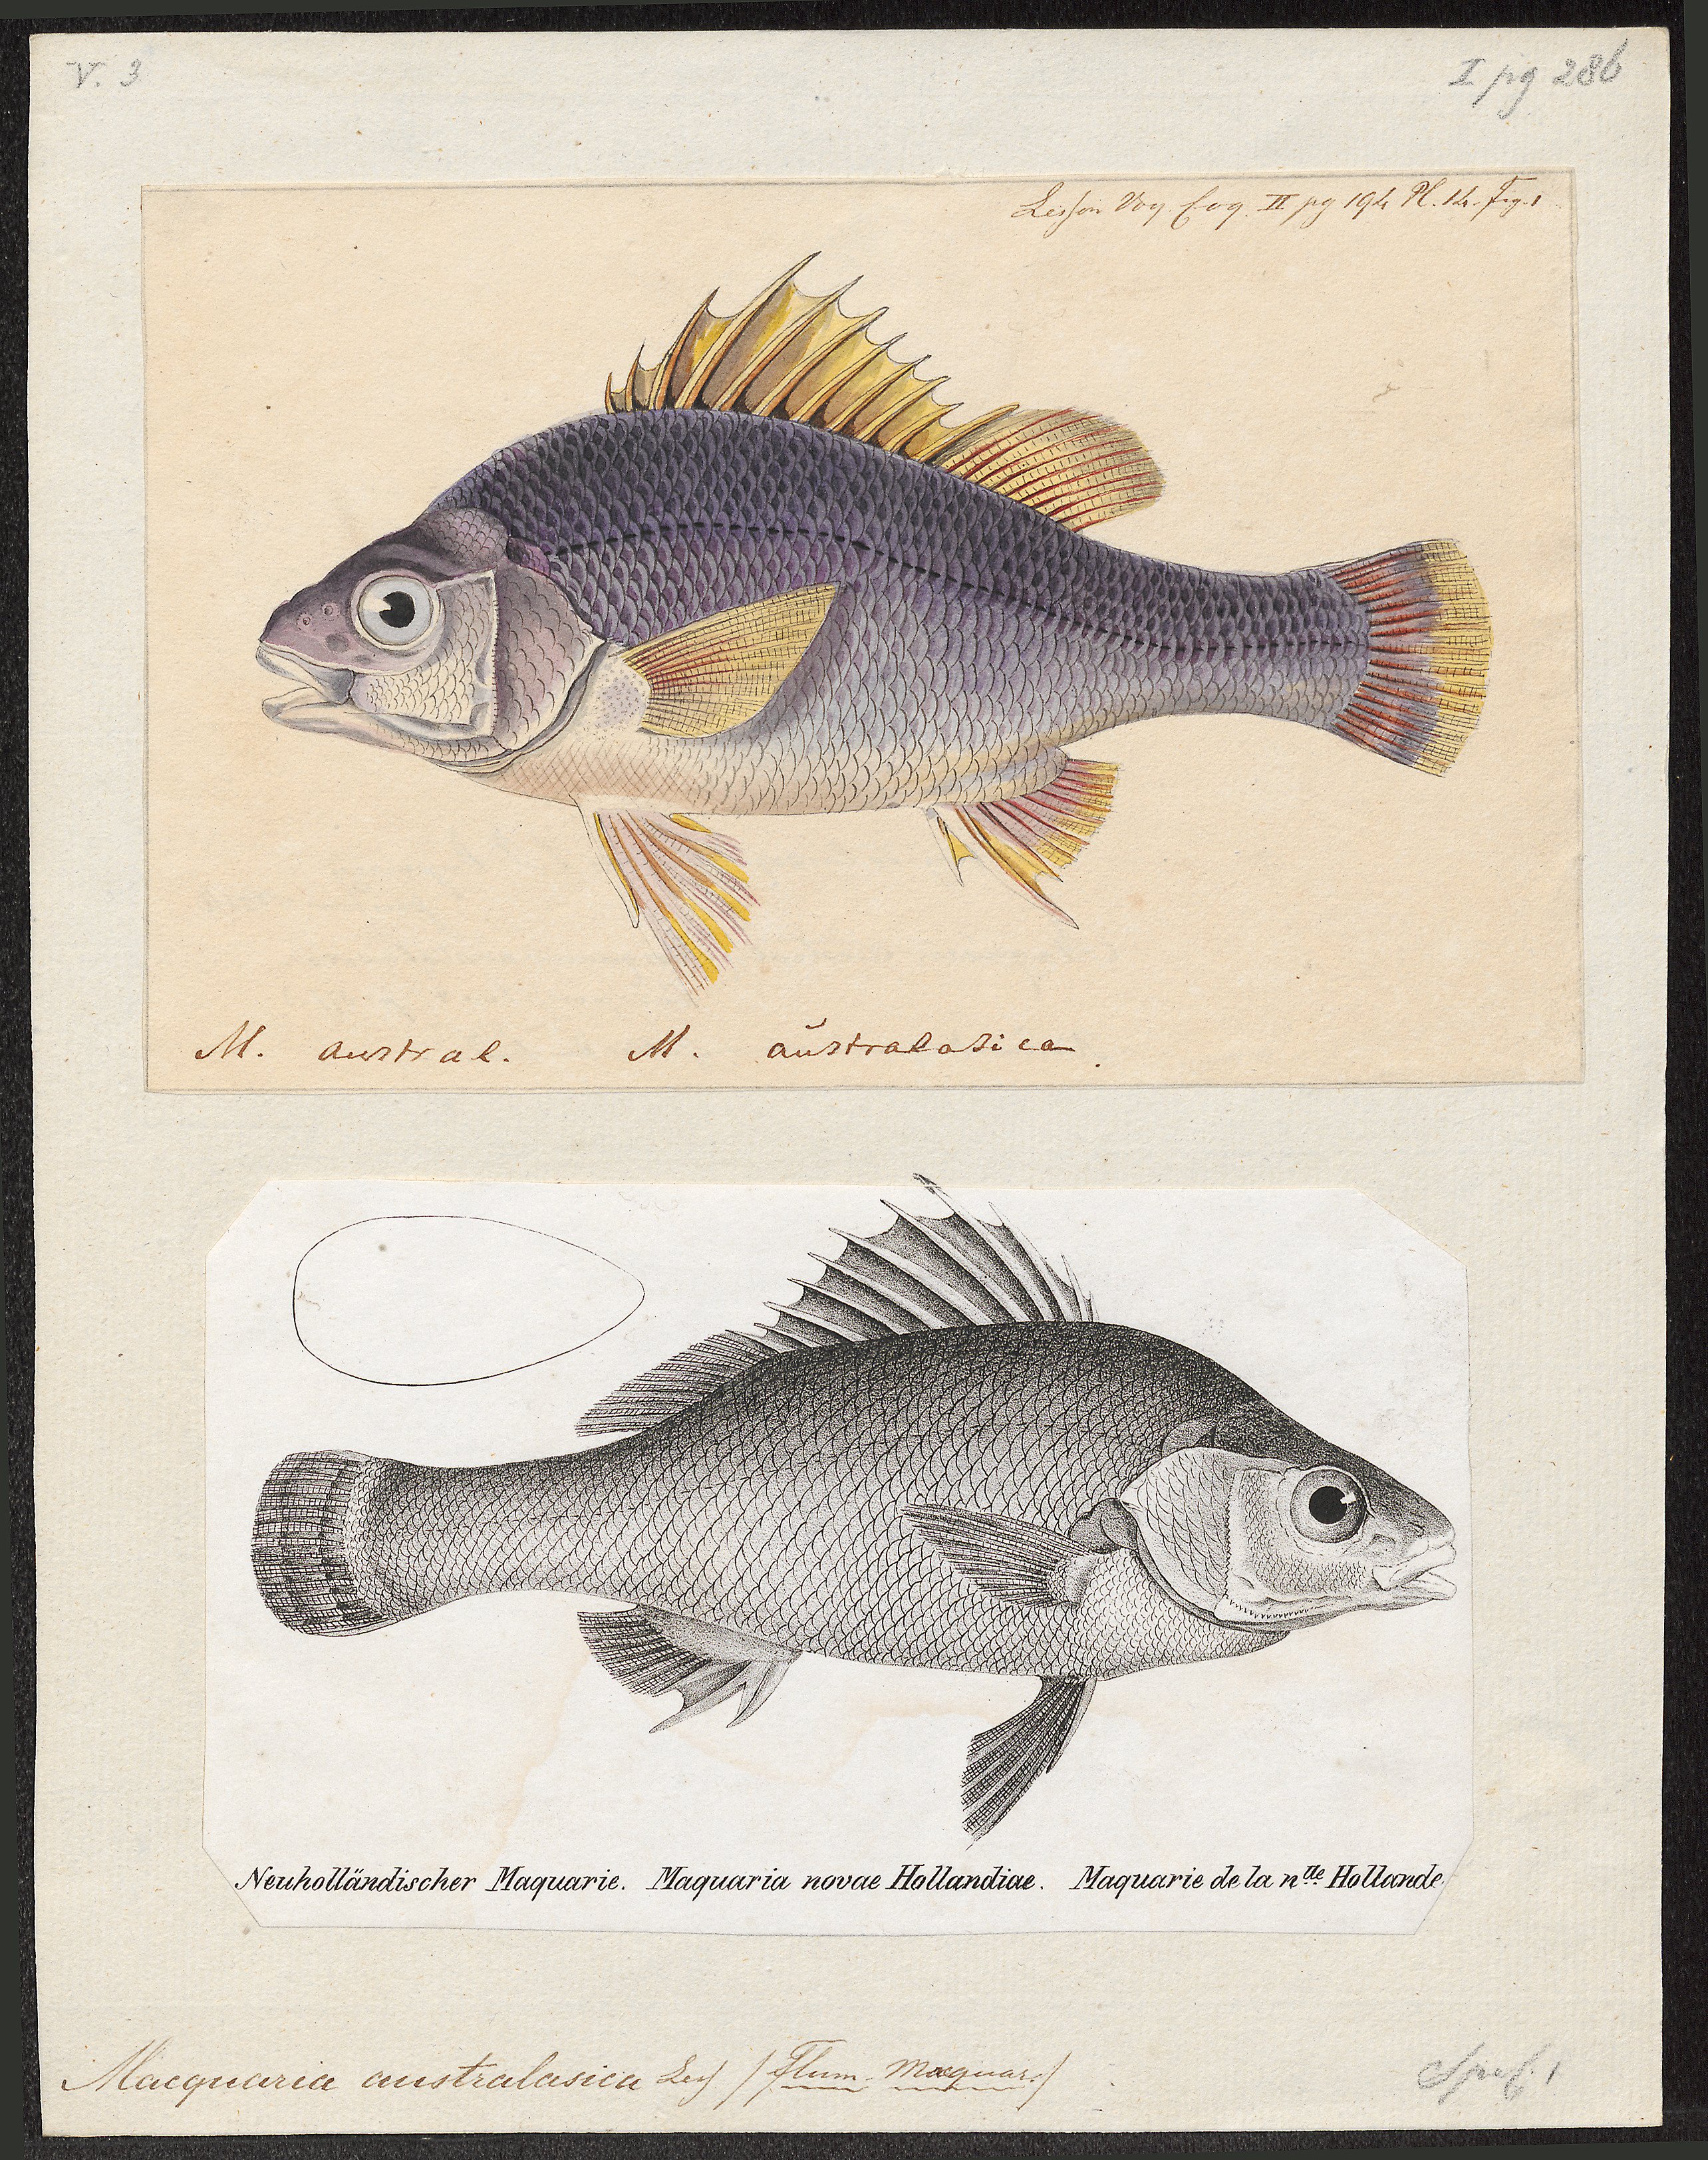 Image of Macquarie Perch